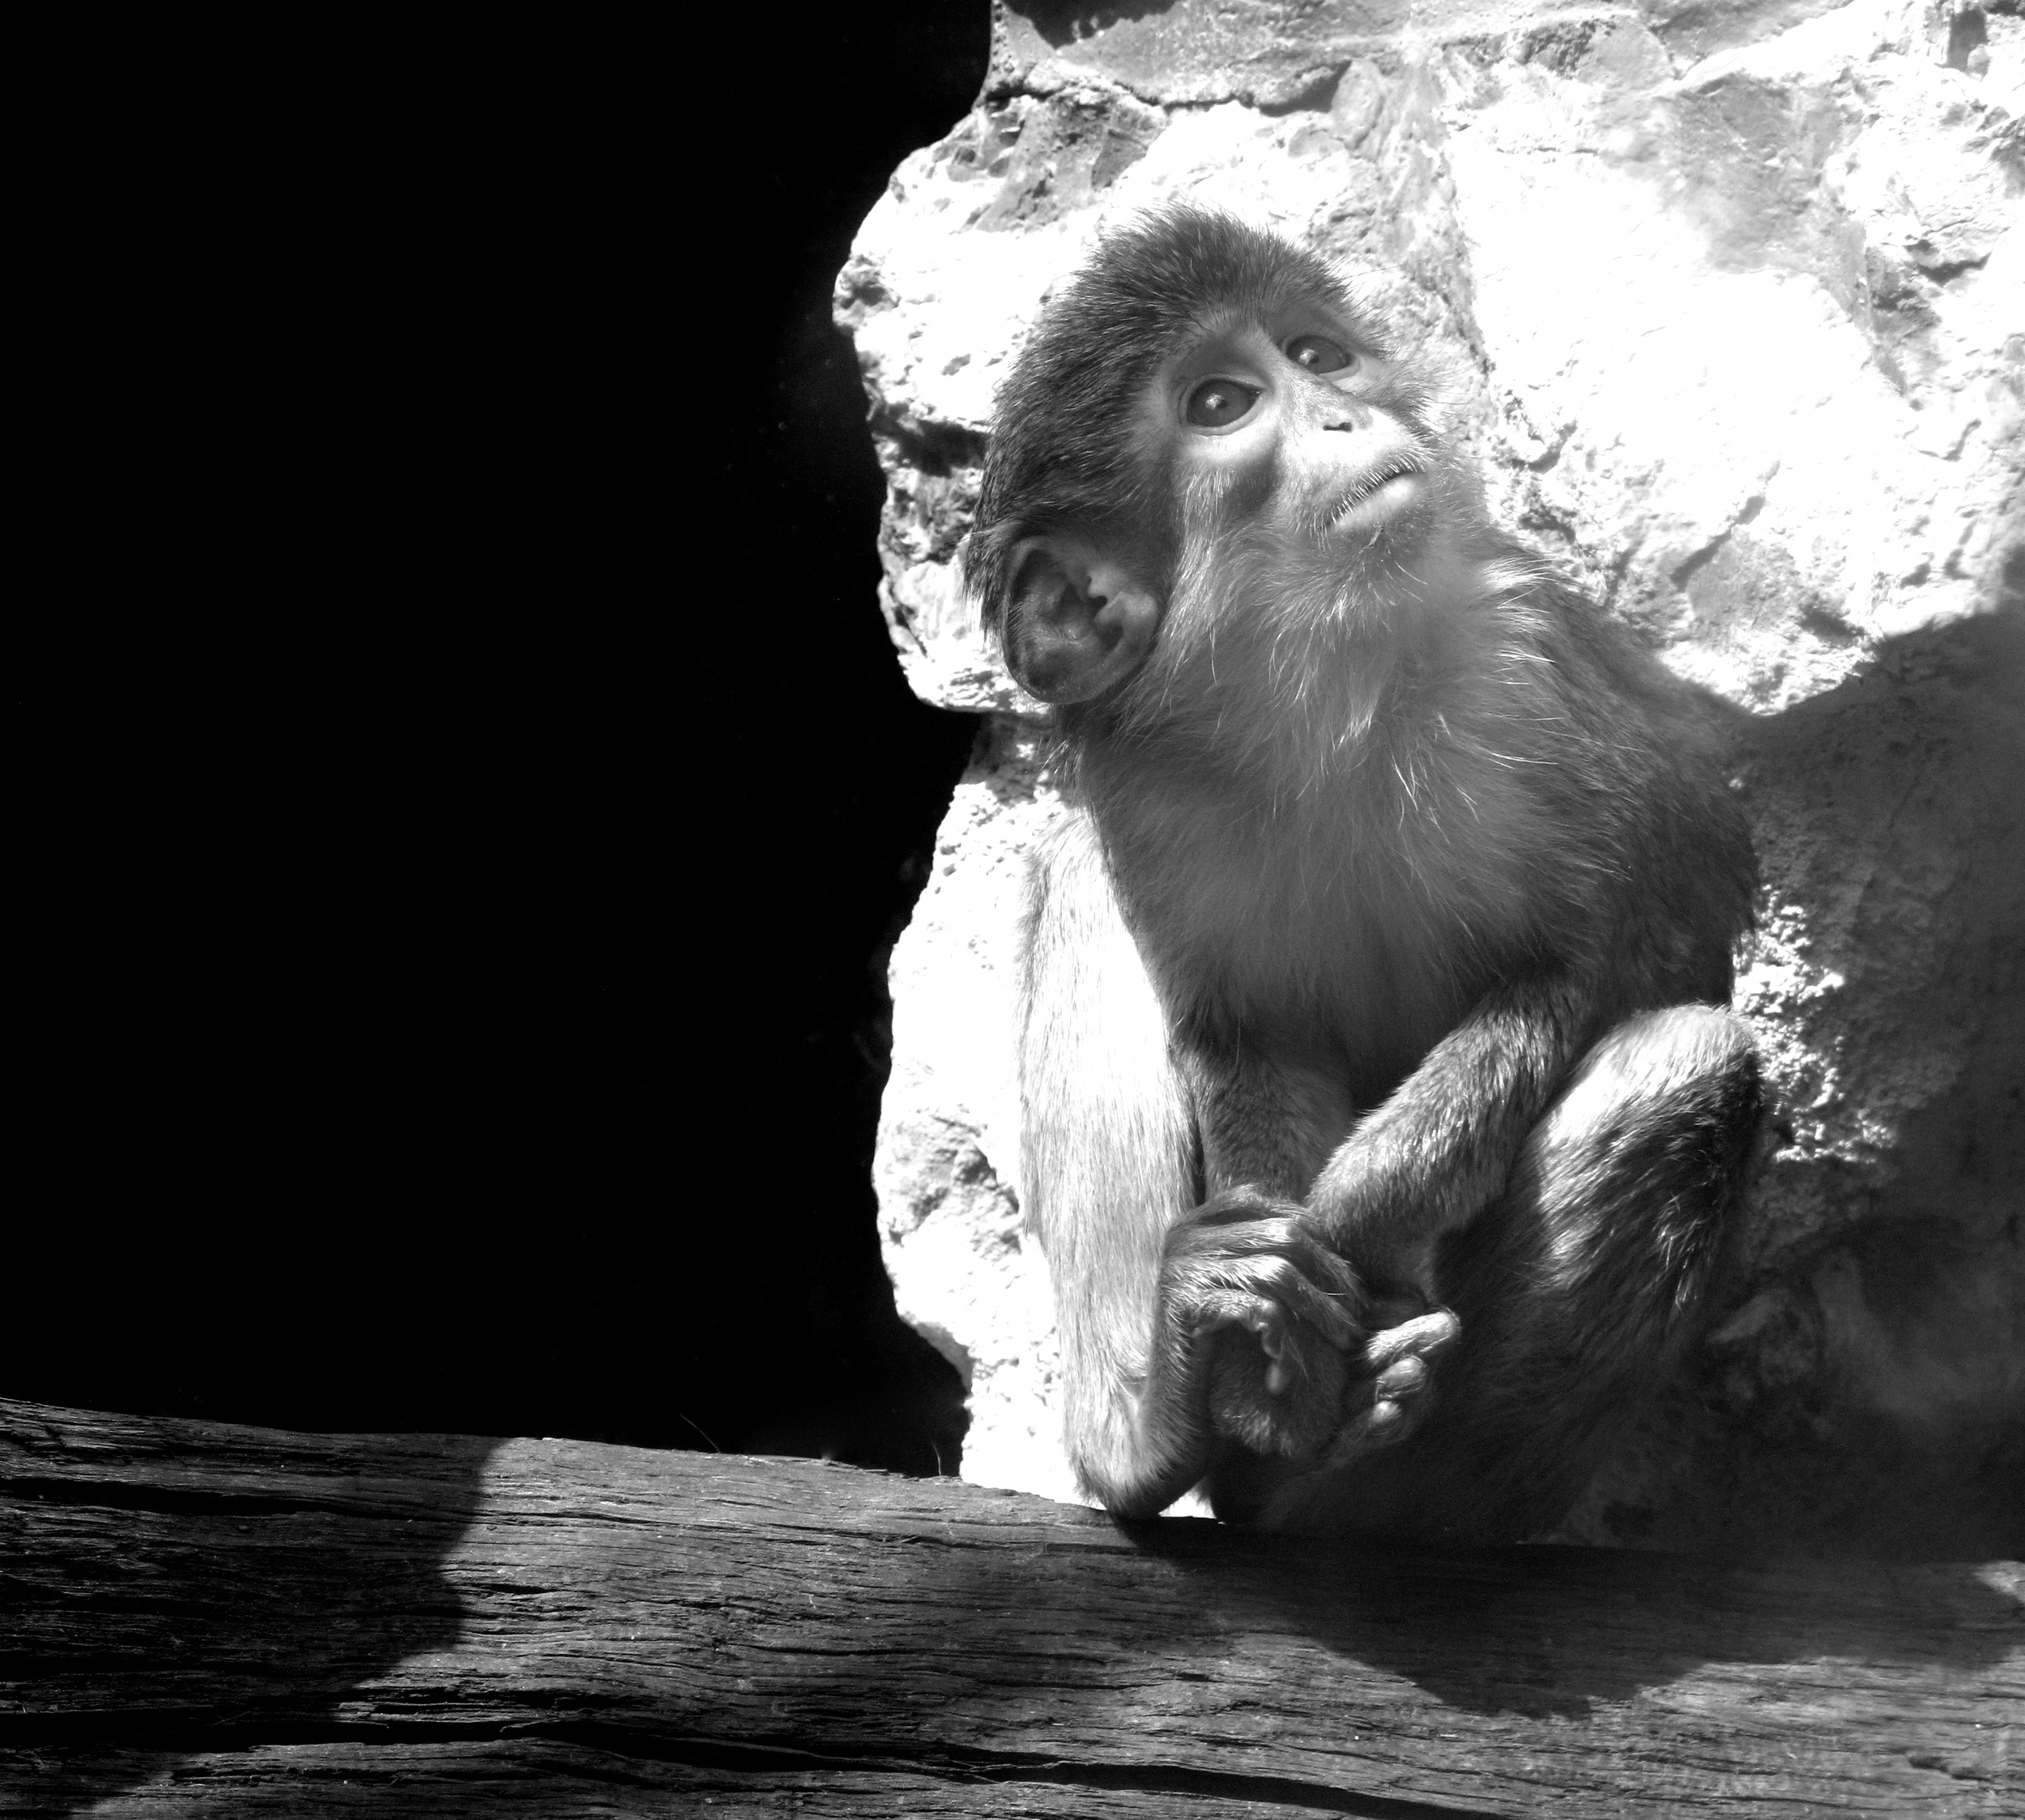 Monkey black and white photograph - Prague Zoo